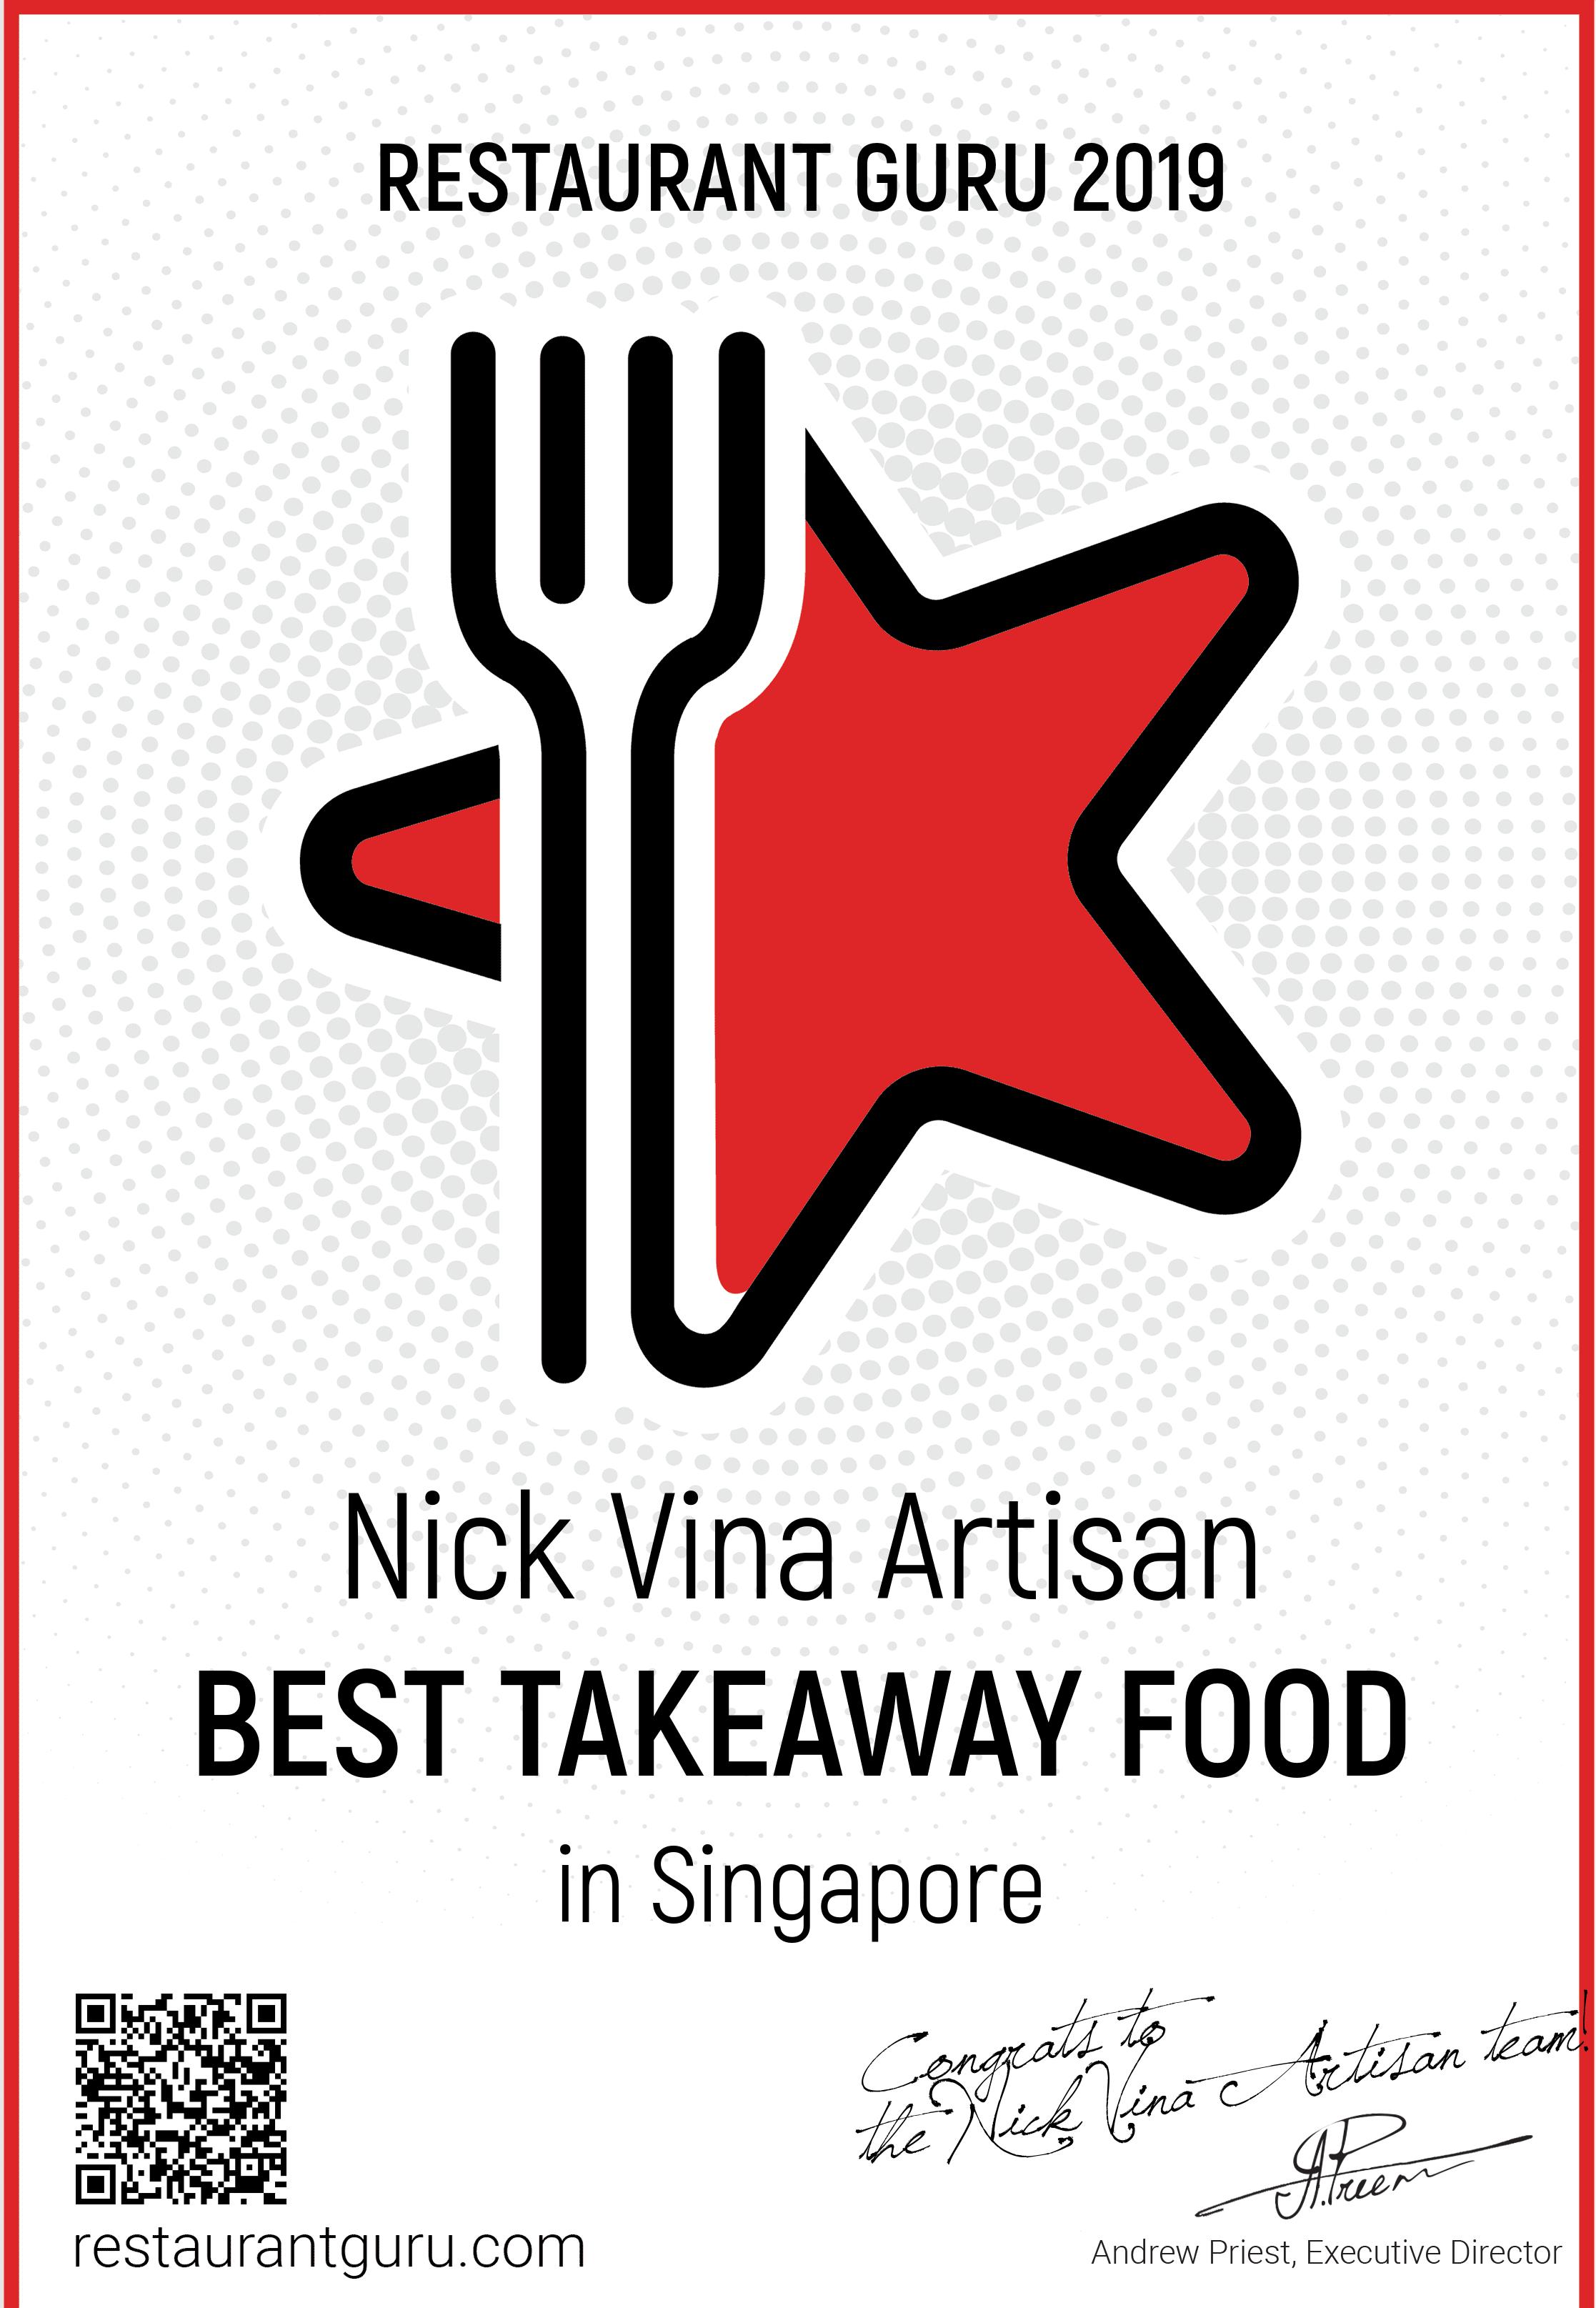 http://www.nickvina.com/wp-content/uploads/2014/11/RestaurantGuru_Certificate1-2.png